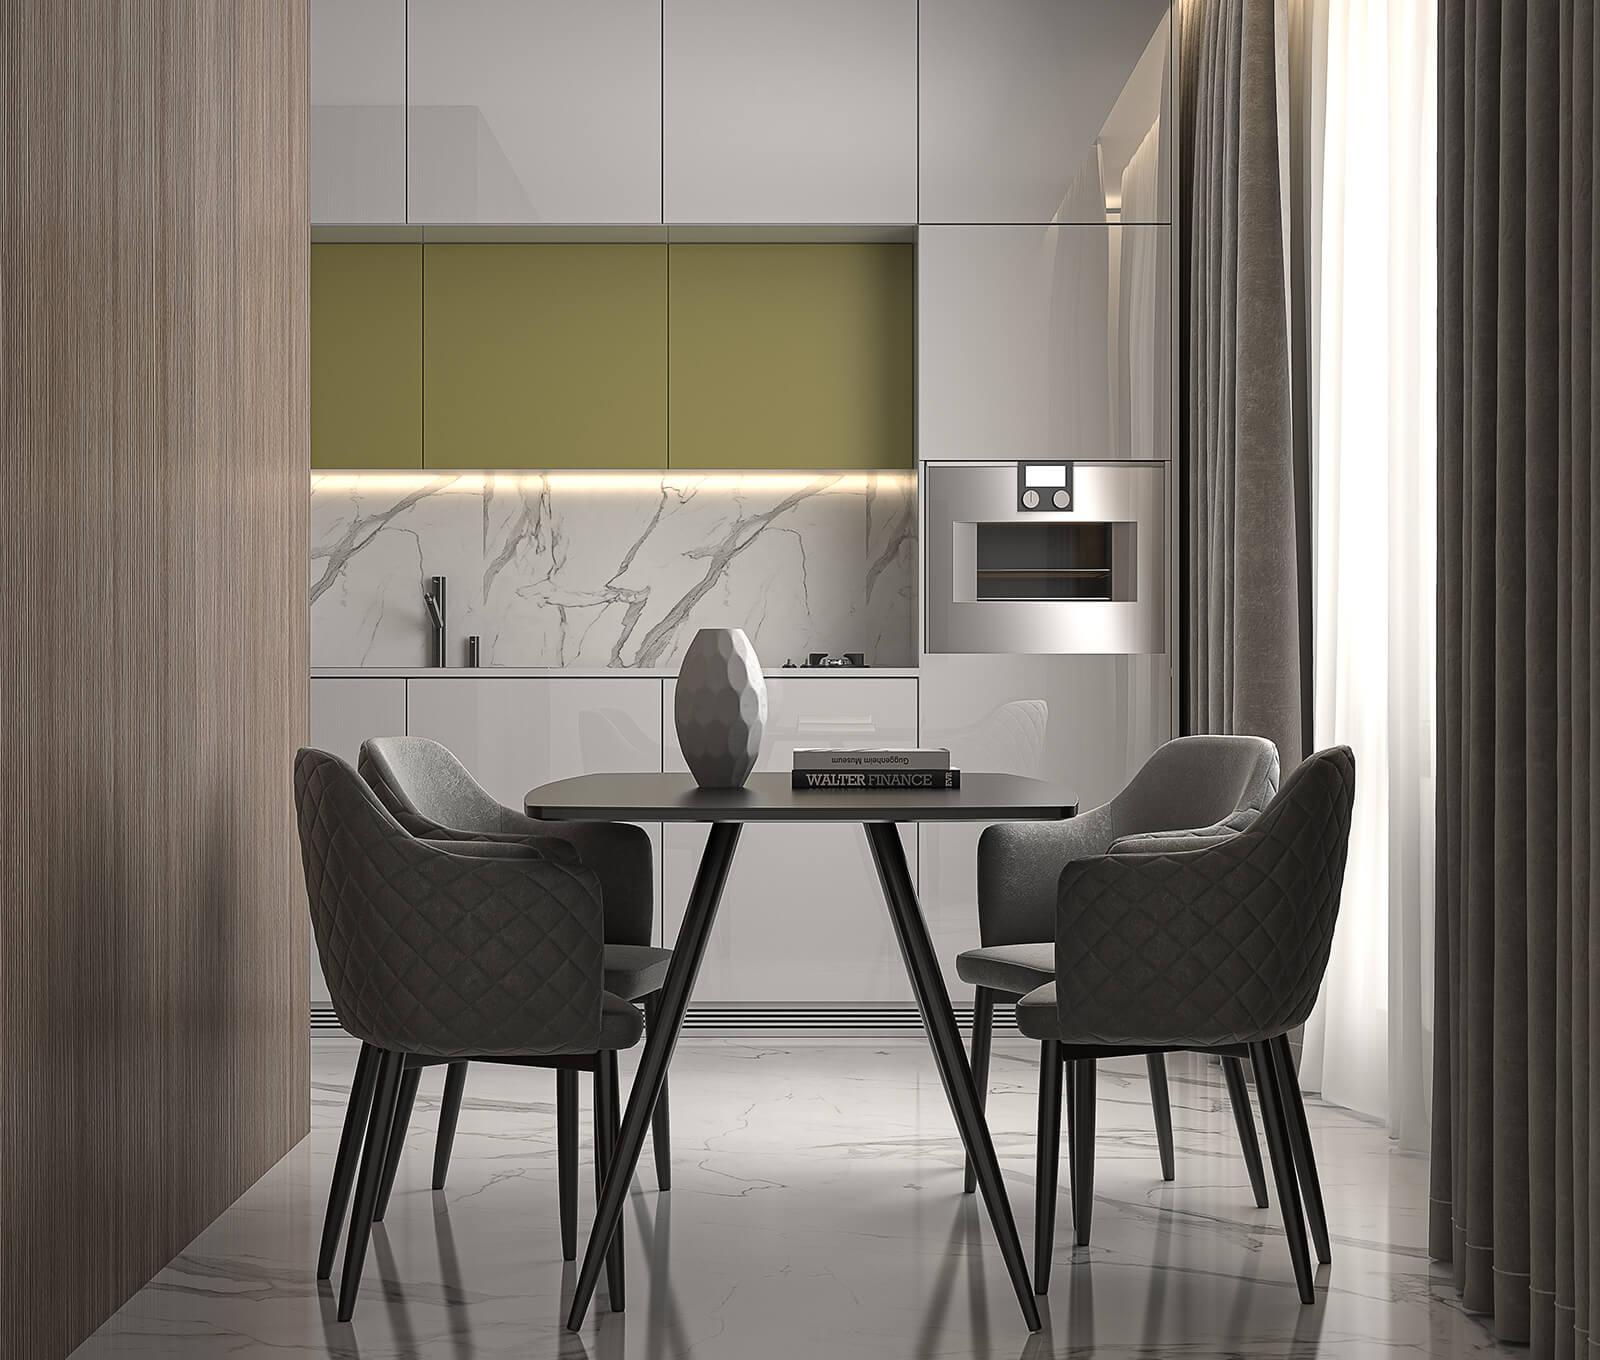 interioren-dizain-proekt-na-kuhnia-s-trapezavia-anika